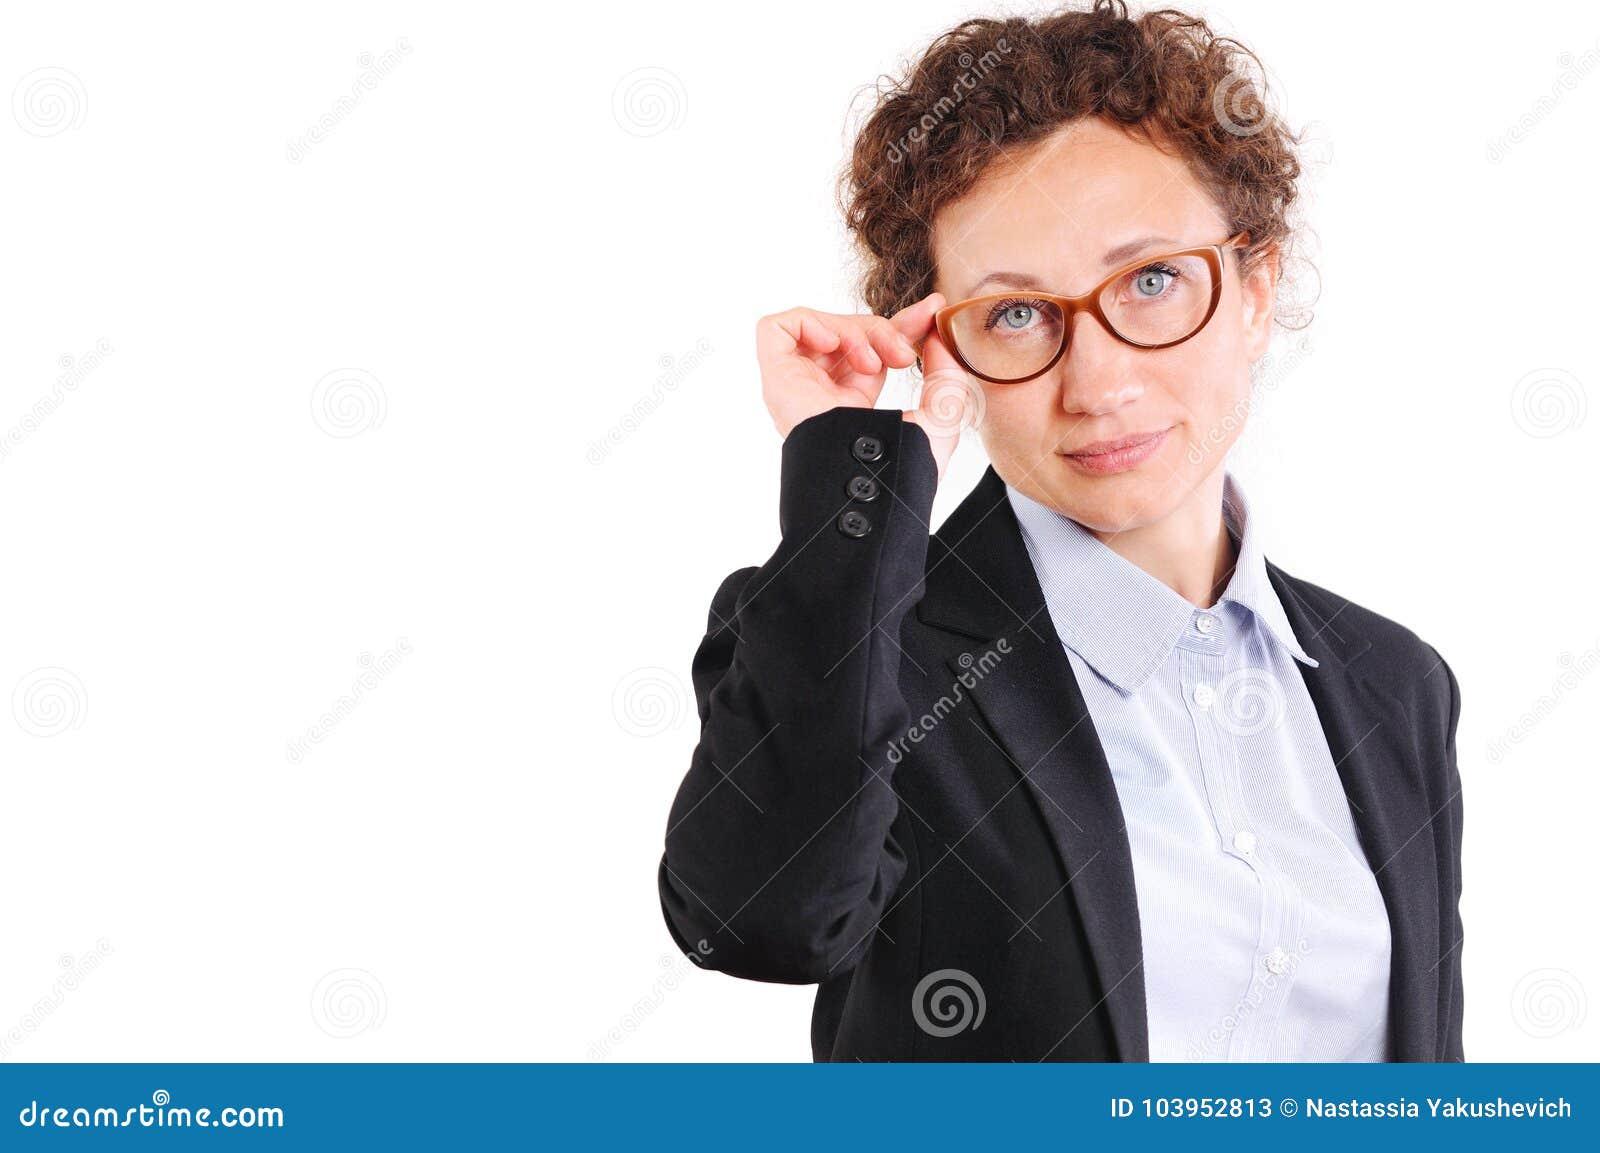 woman Mature business